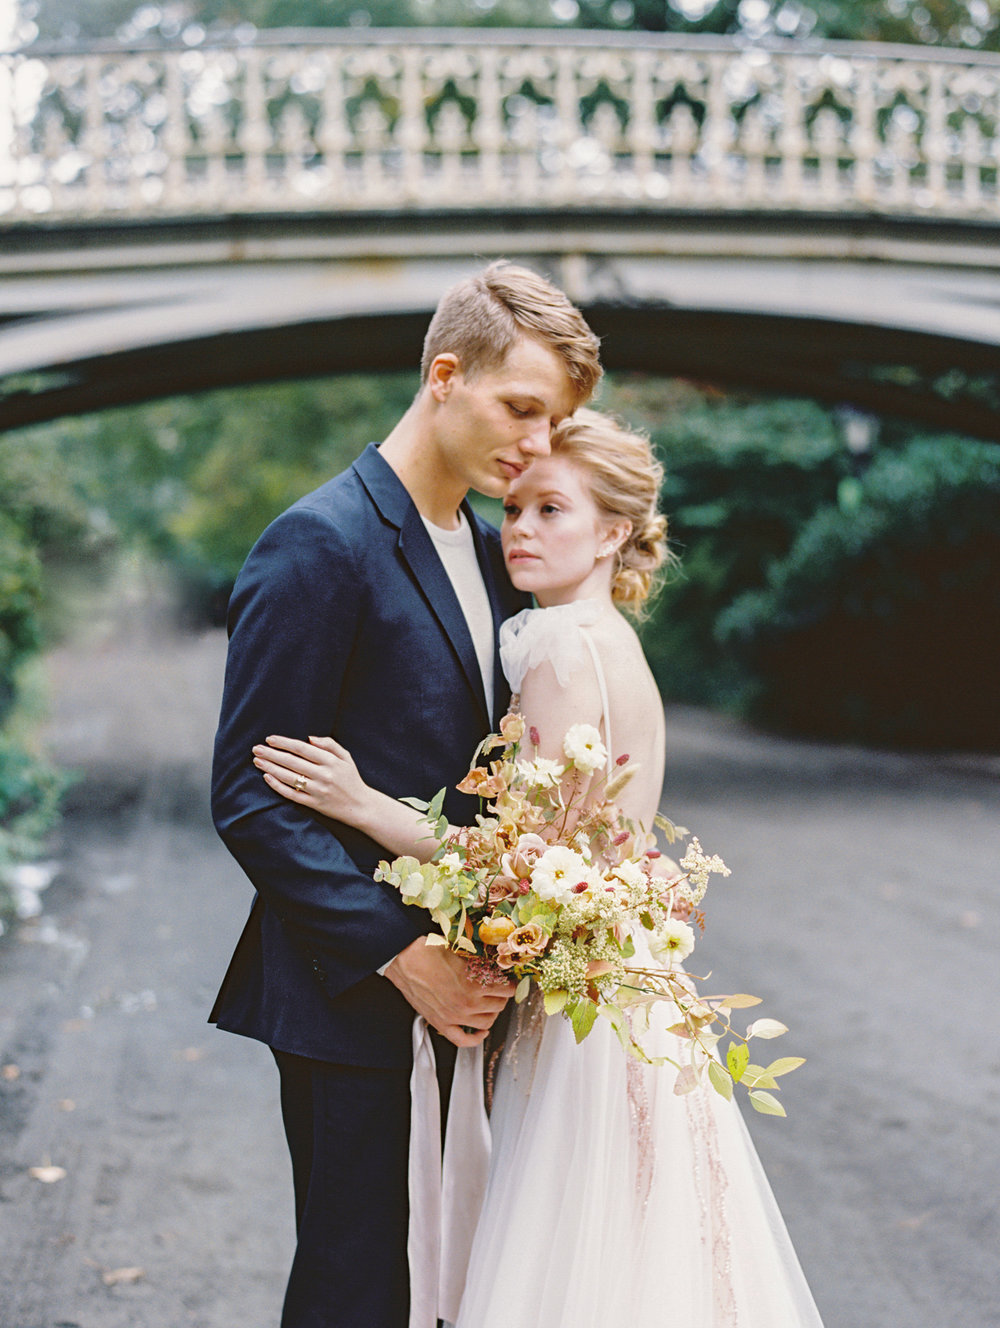 kelsandmichael_bridaleditorial_harvestelopement-73.jpg